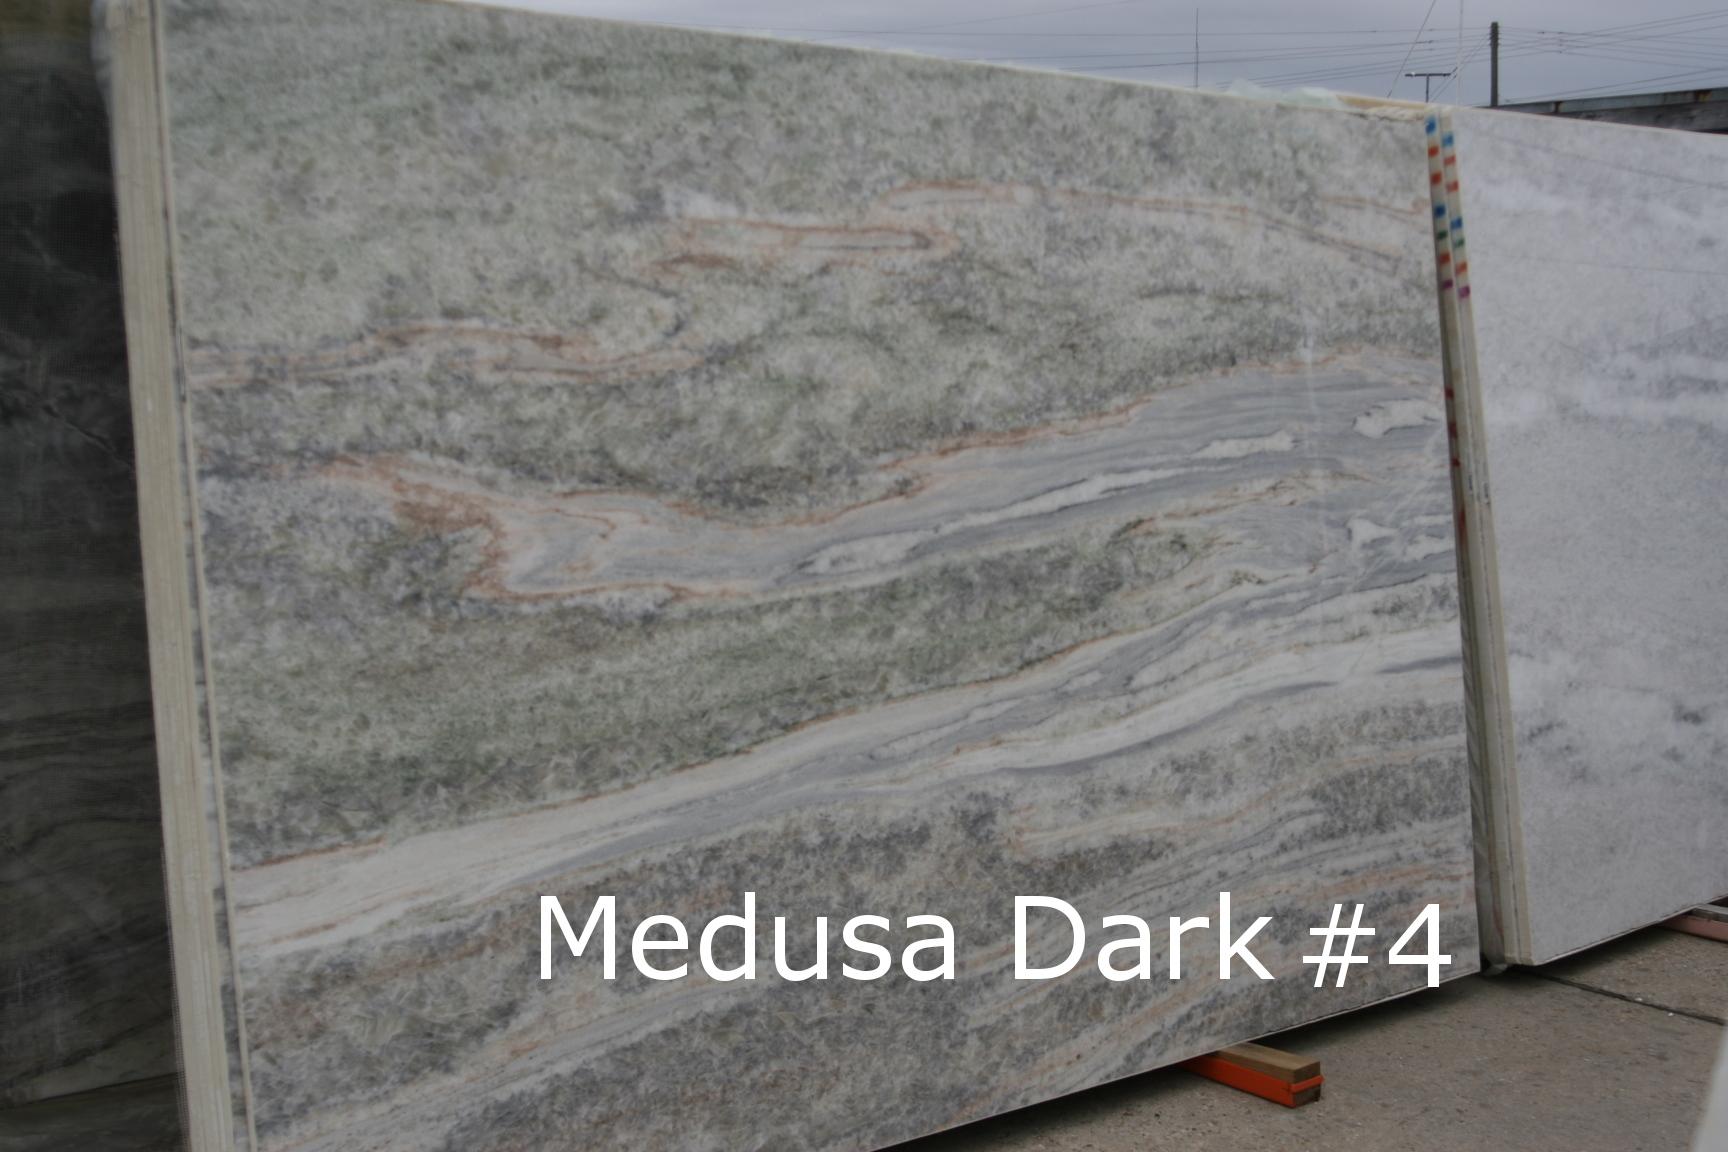 Medusa Dark #4